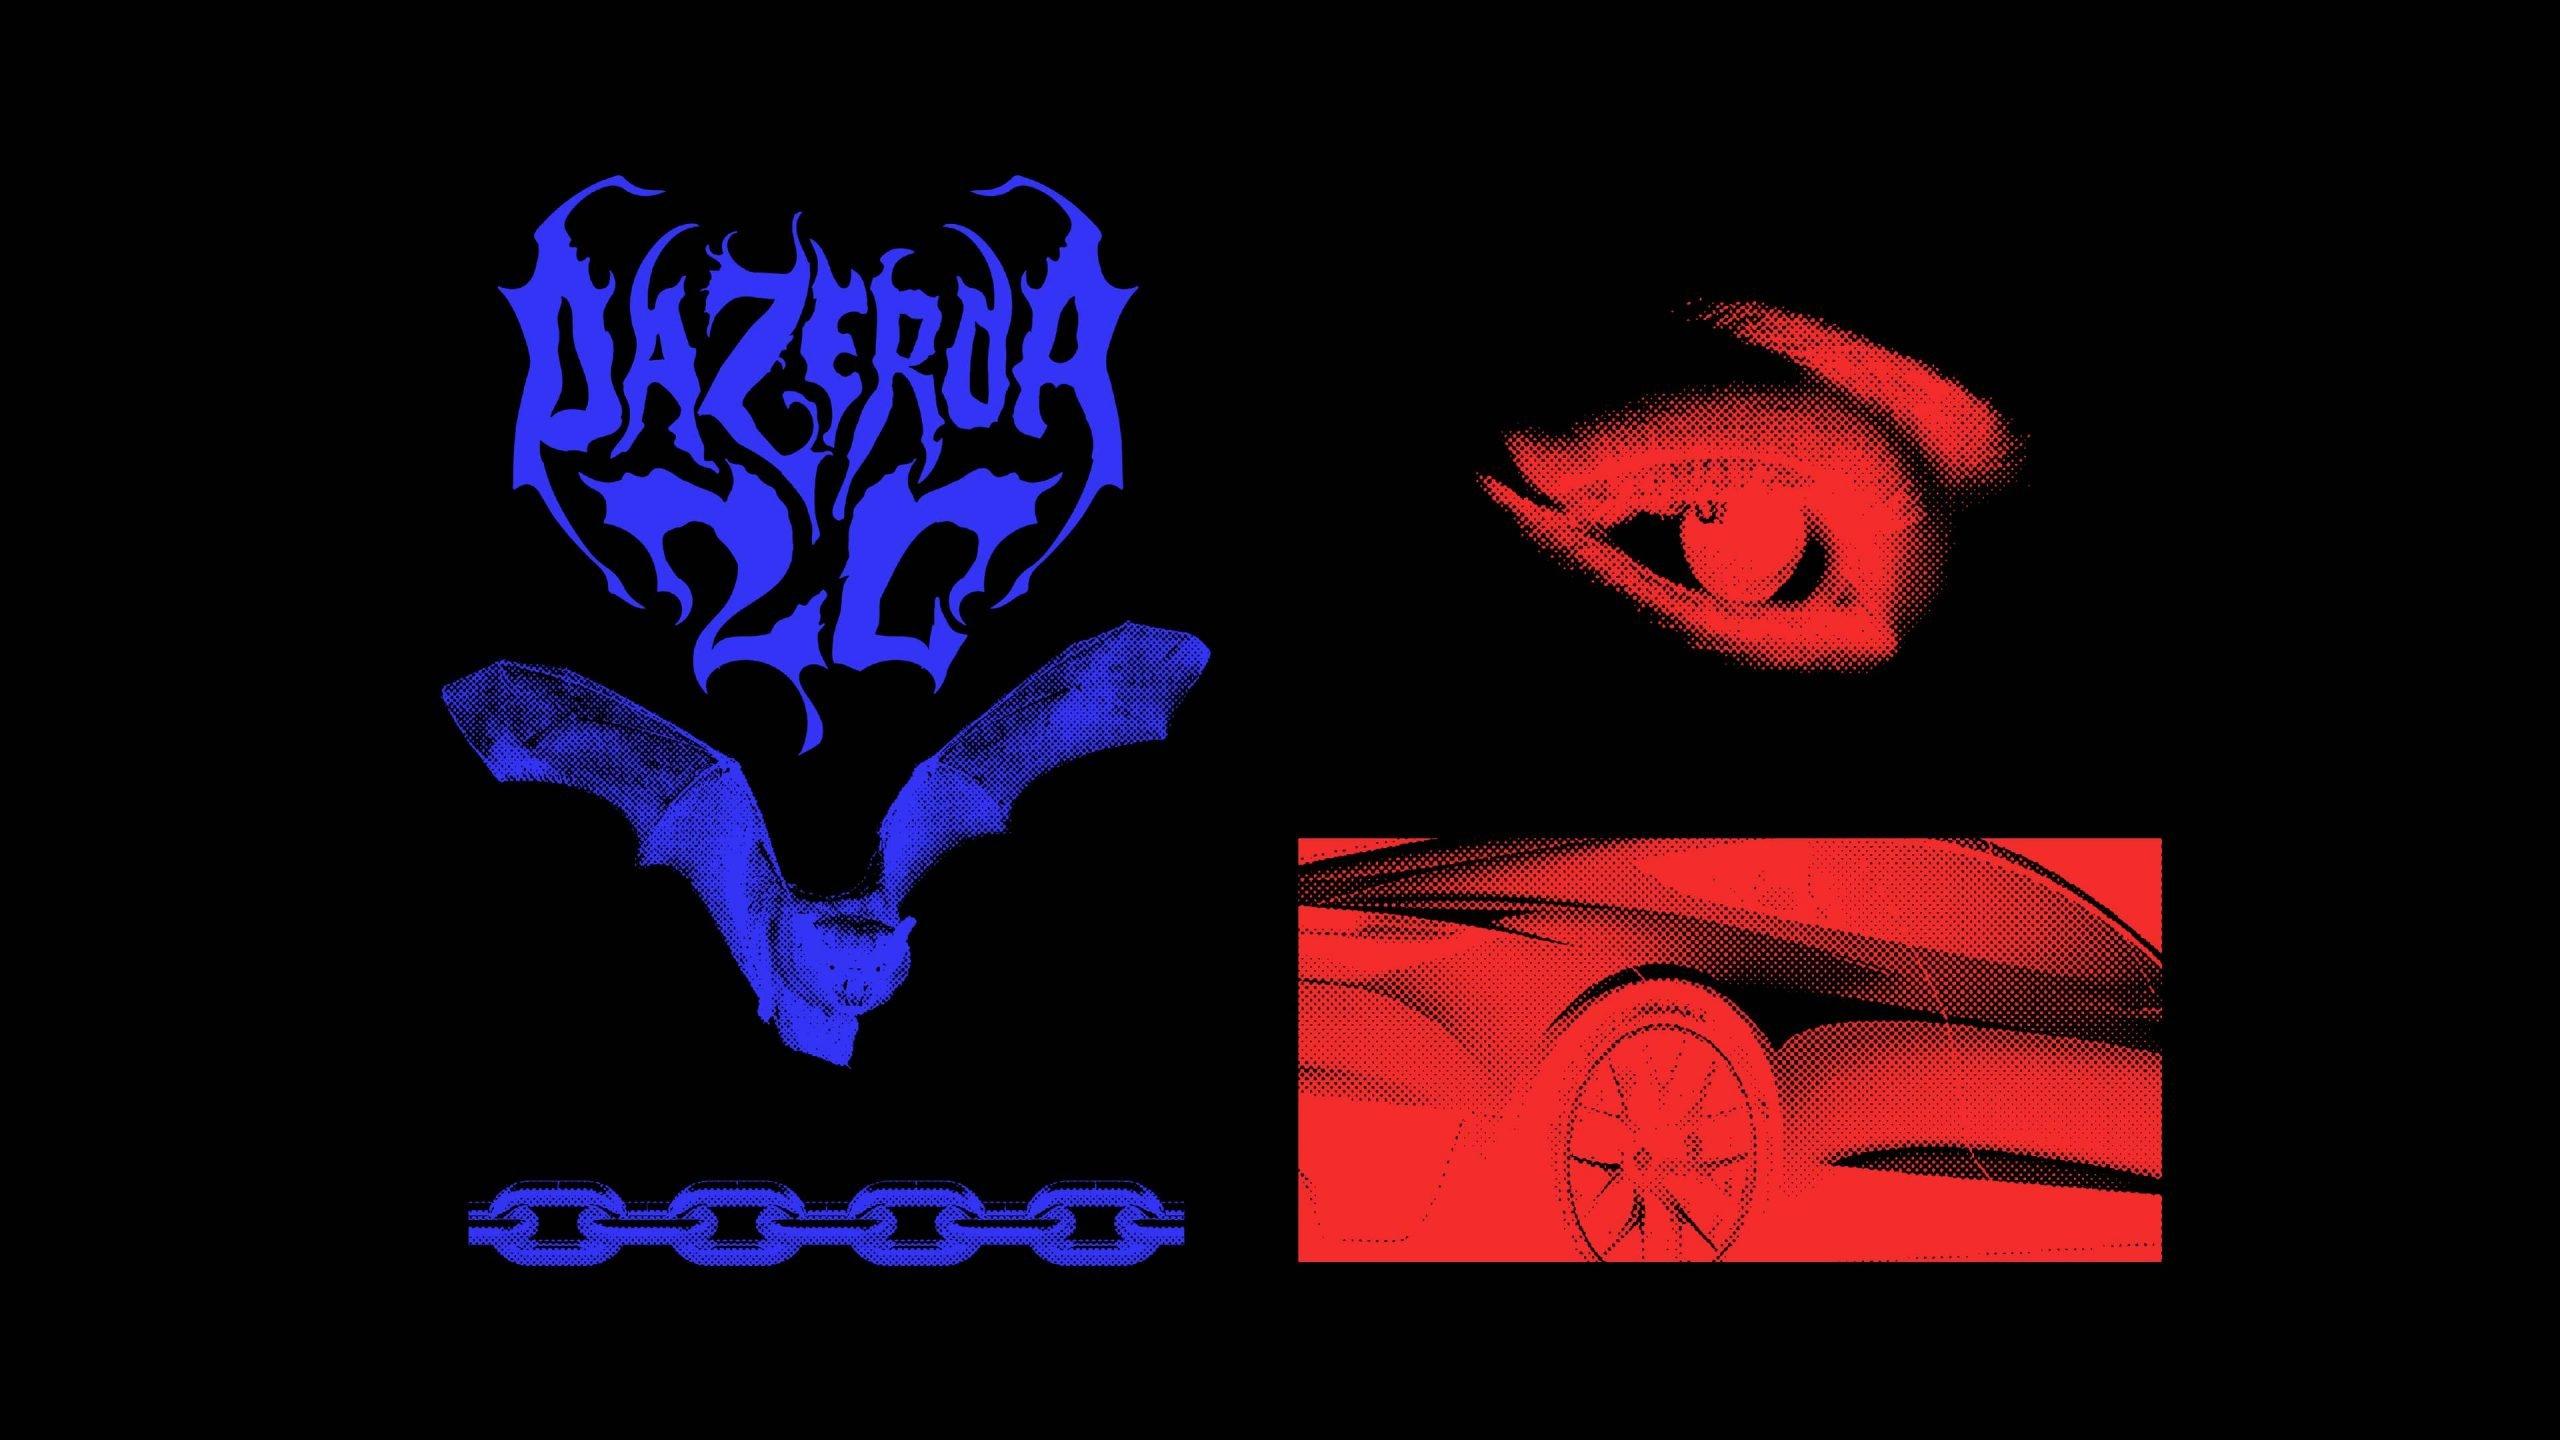 CAPO-PLAZA-TOUR-MERCH-Product-03-Graphics-01